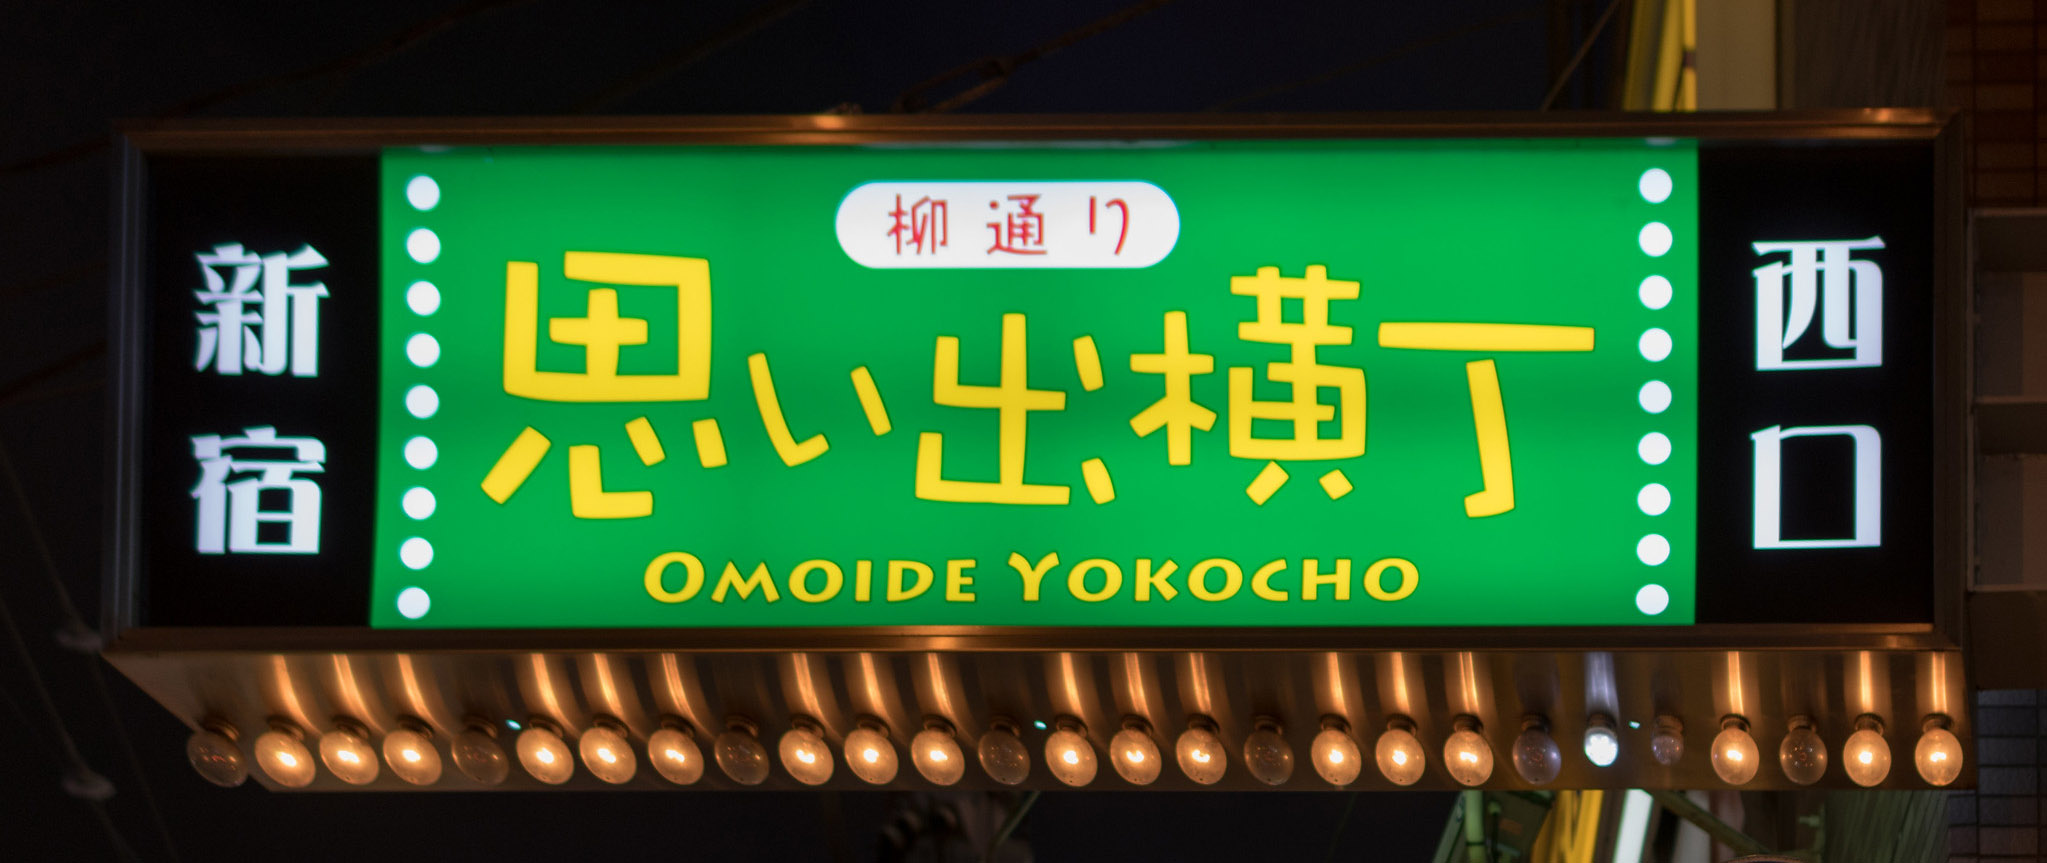 OMOIDE YOKOCHO : Les izakaya de l'envers